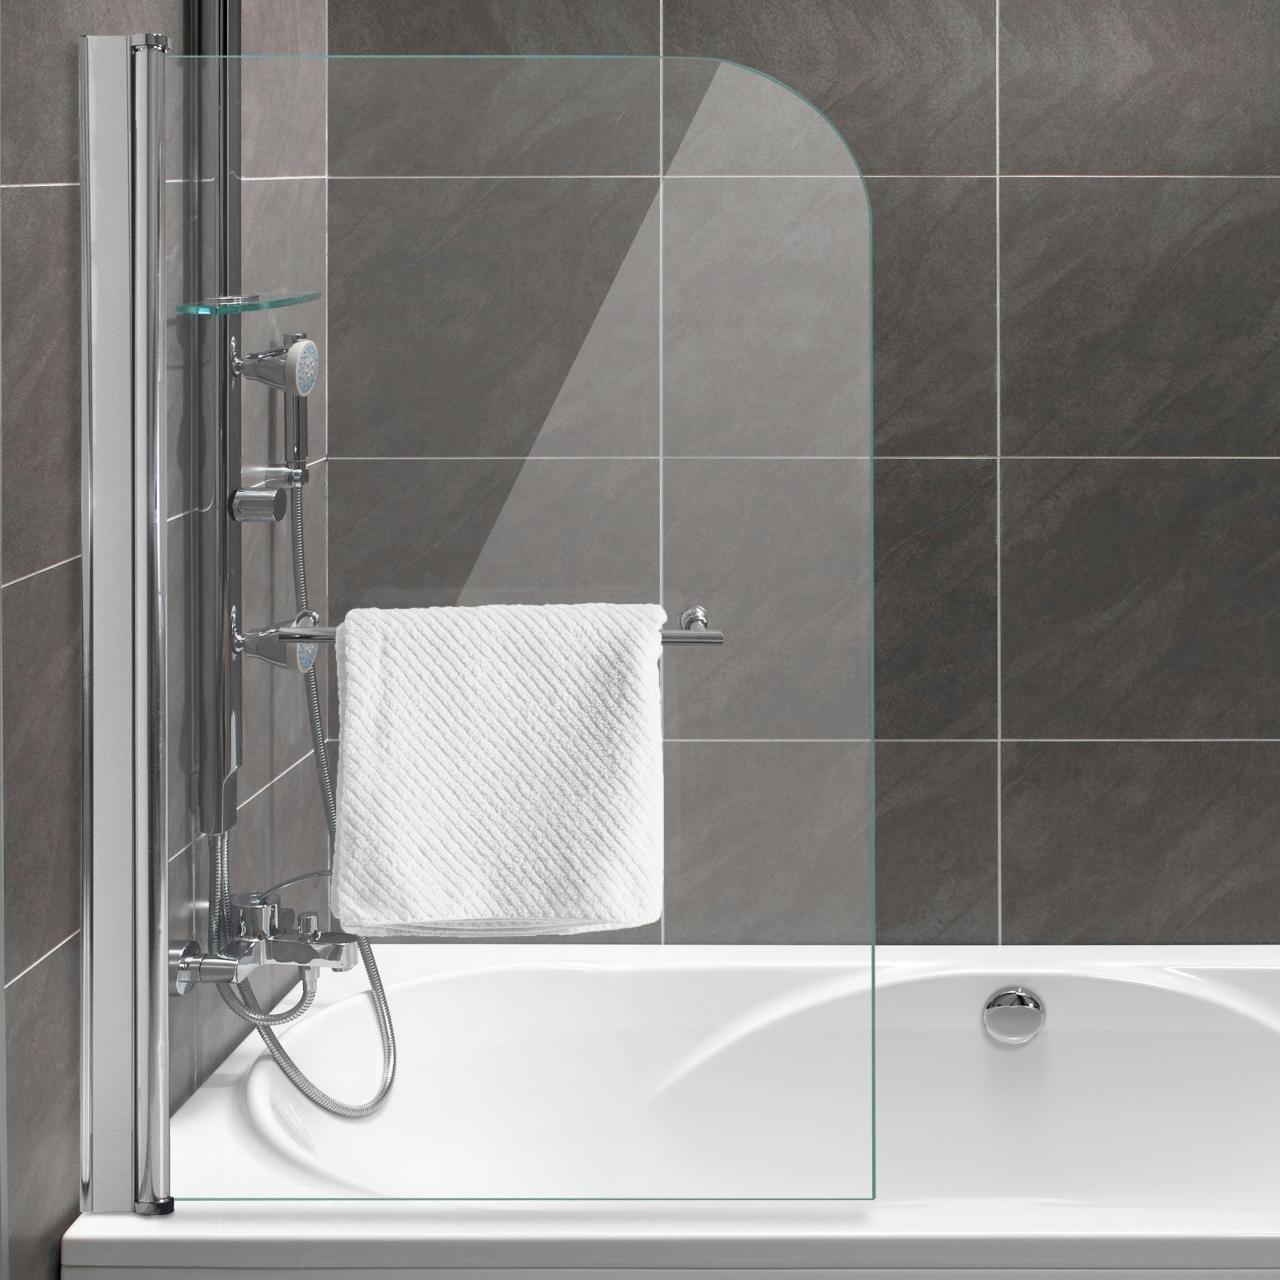 Home Lux – Mampara para bañera plegable pared faltdusch pared (B X H) 80 x 130 cm, cristal de seguridad 6 mm con efecto lotus: Amazon.es: Hogar